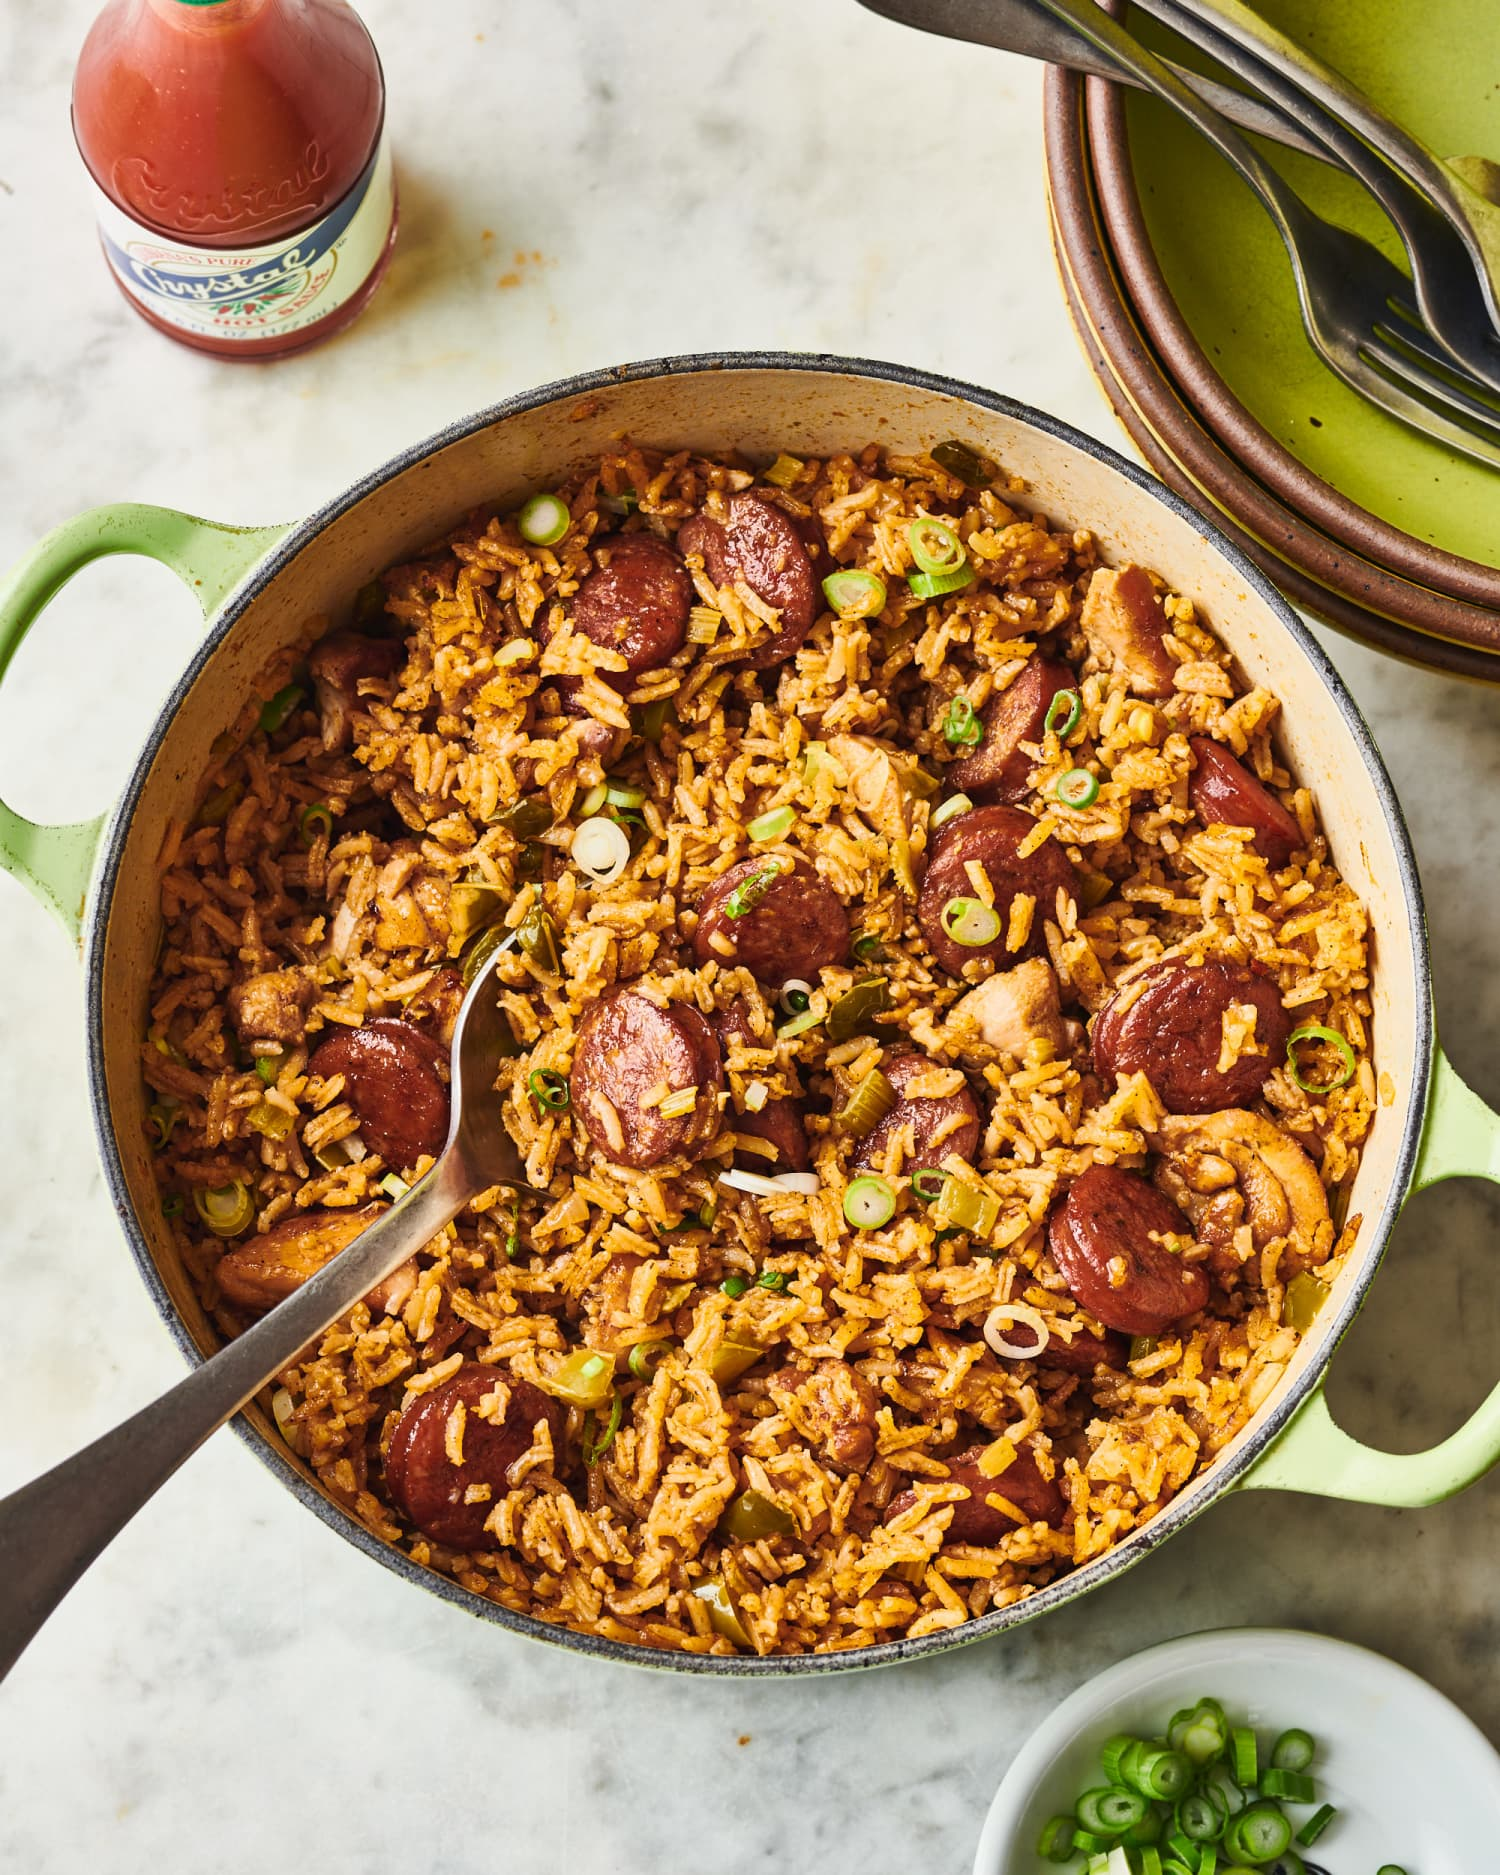 Instant Pot Best Recipes & Tips - cover